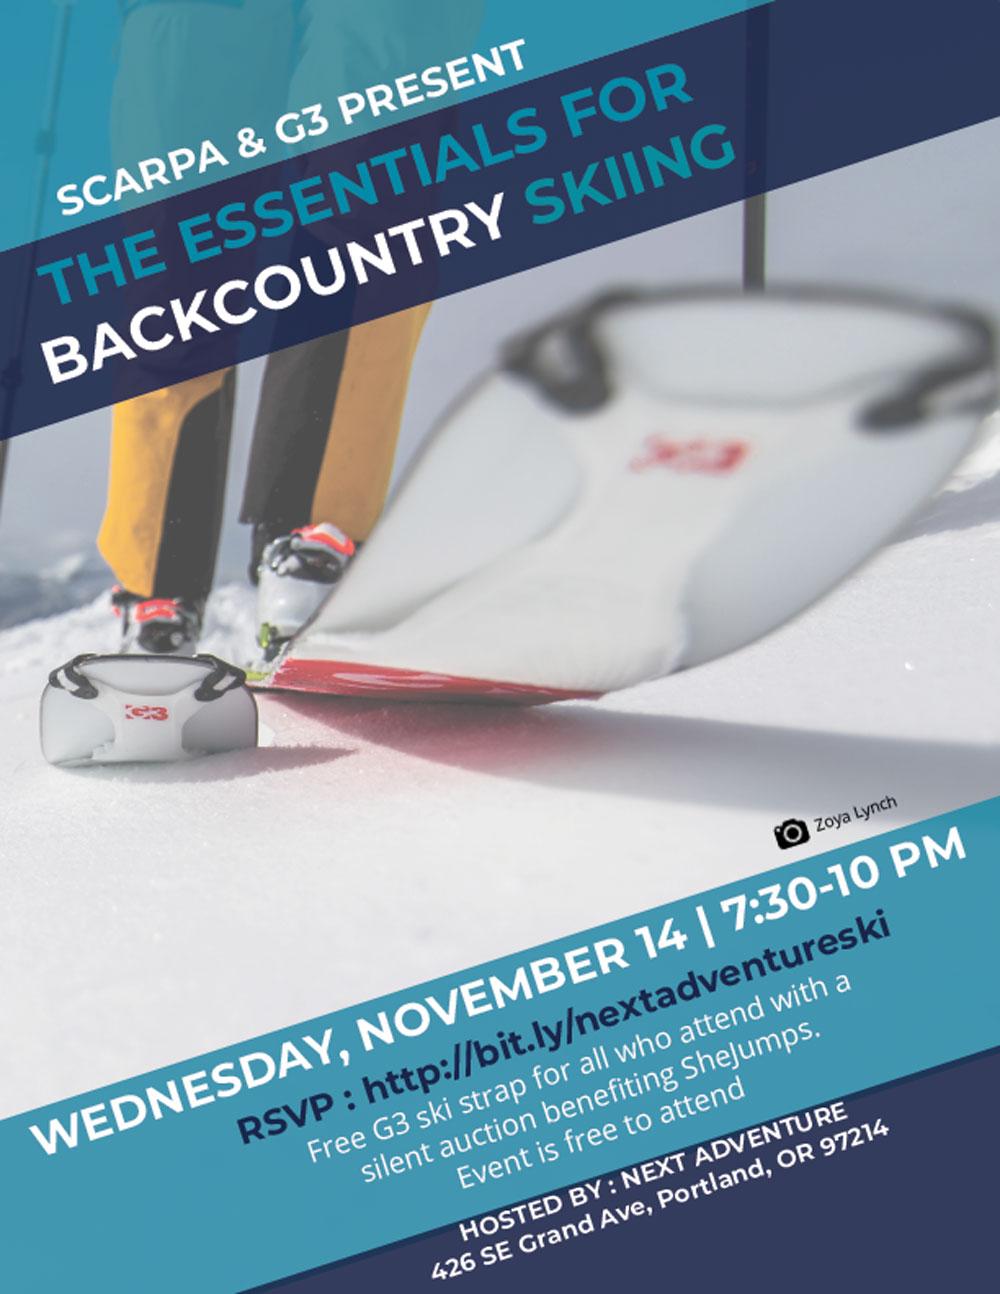 Backcountry Ski Clinic